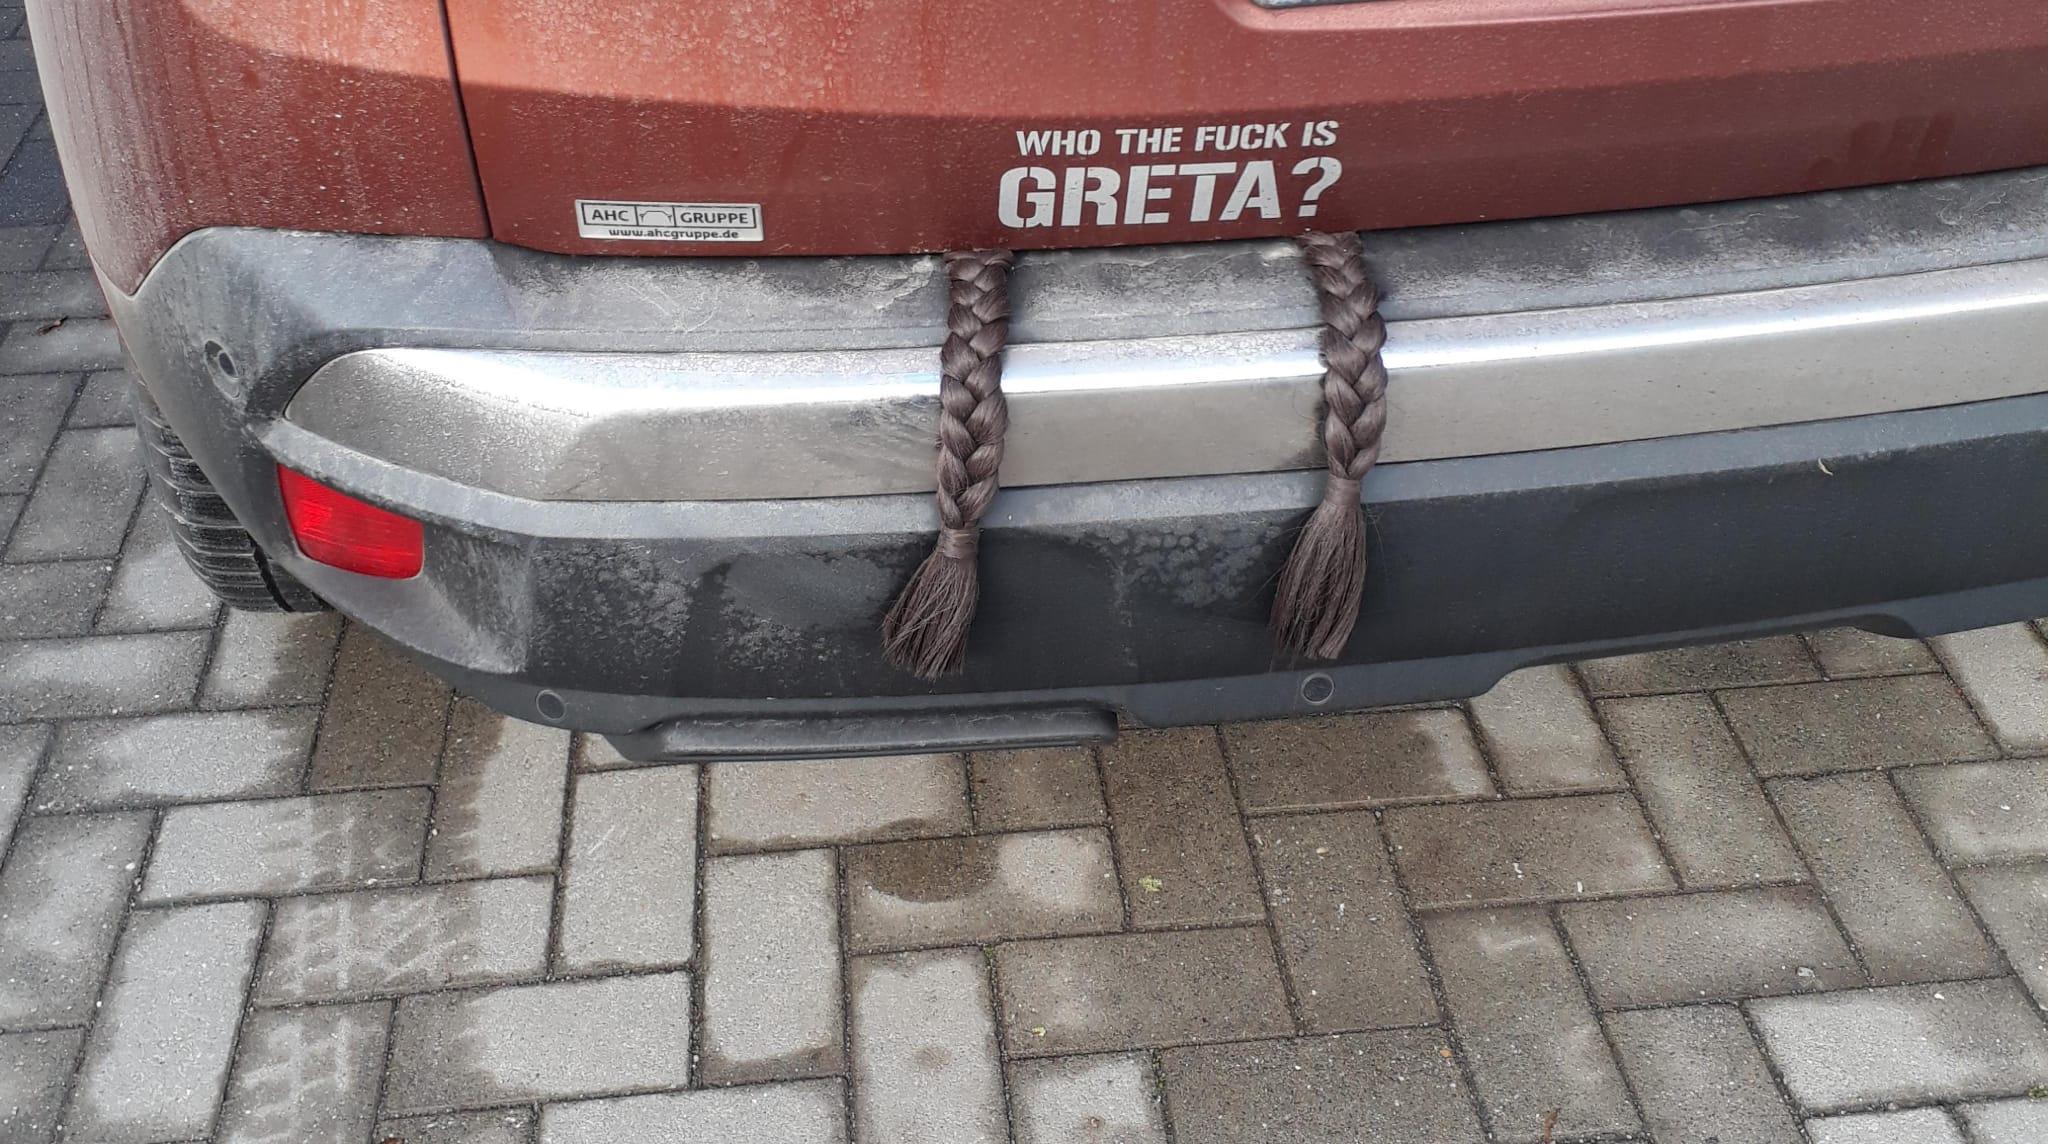 Who the fuck is Greta Thunberg?